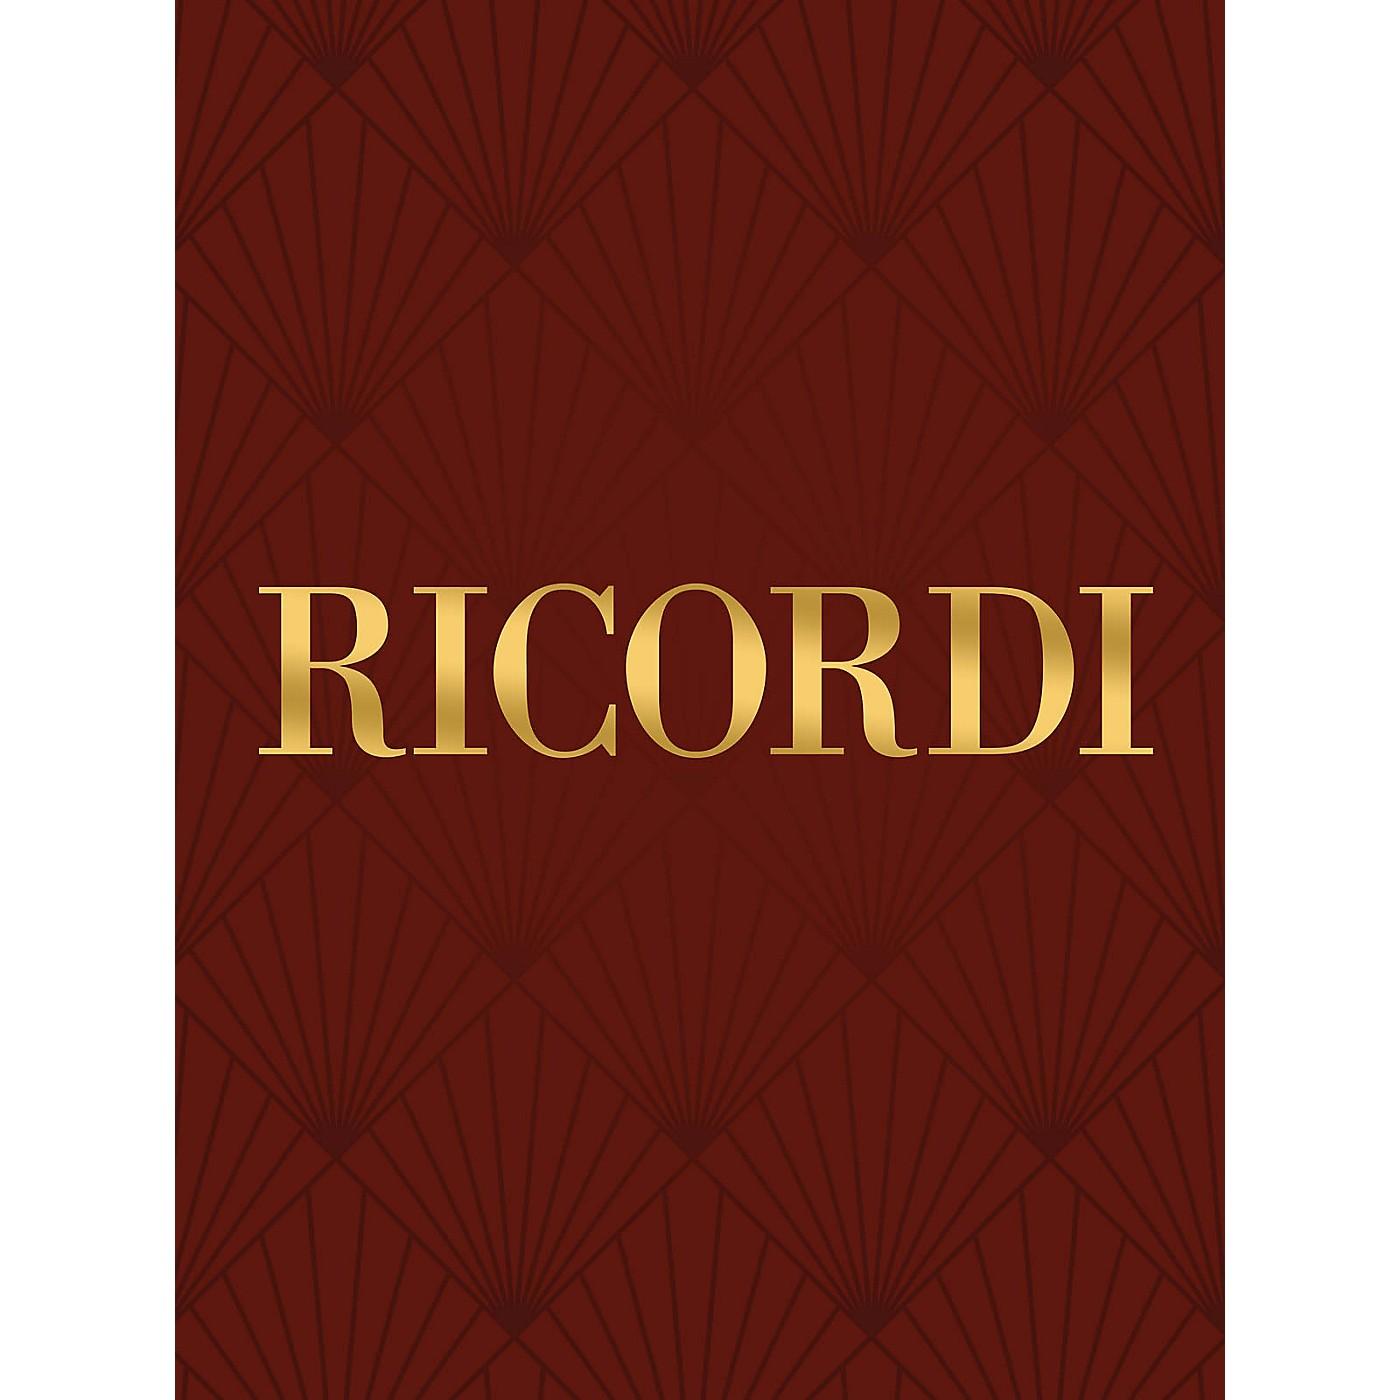 Ricordi Beatus vir RV597 (Vocal Score) SATB Composed by Antonio Vivaldi Edited by Bruno Maderna thumbnail